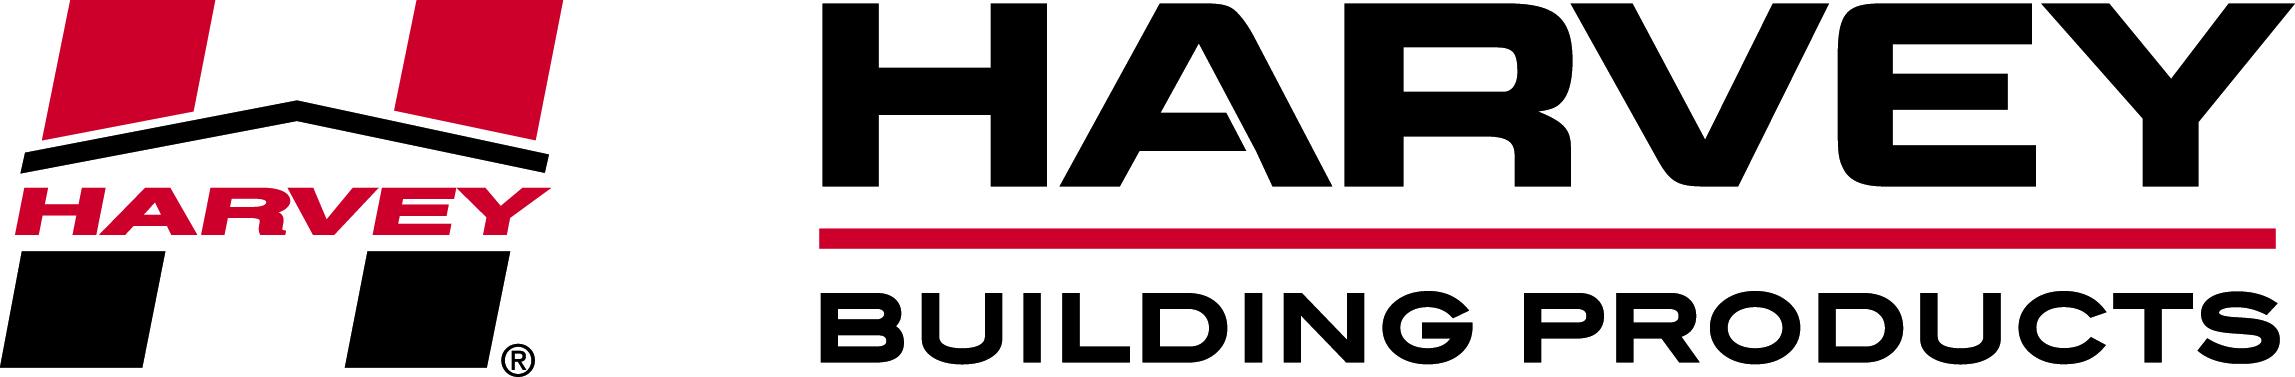 Harvey Windows | 2019 Replacement Windows | HireHaven